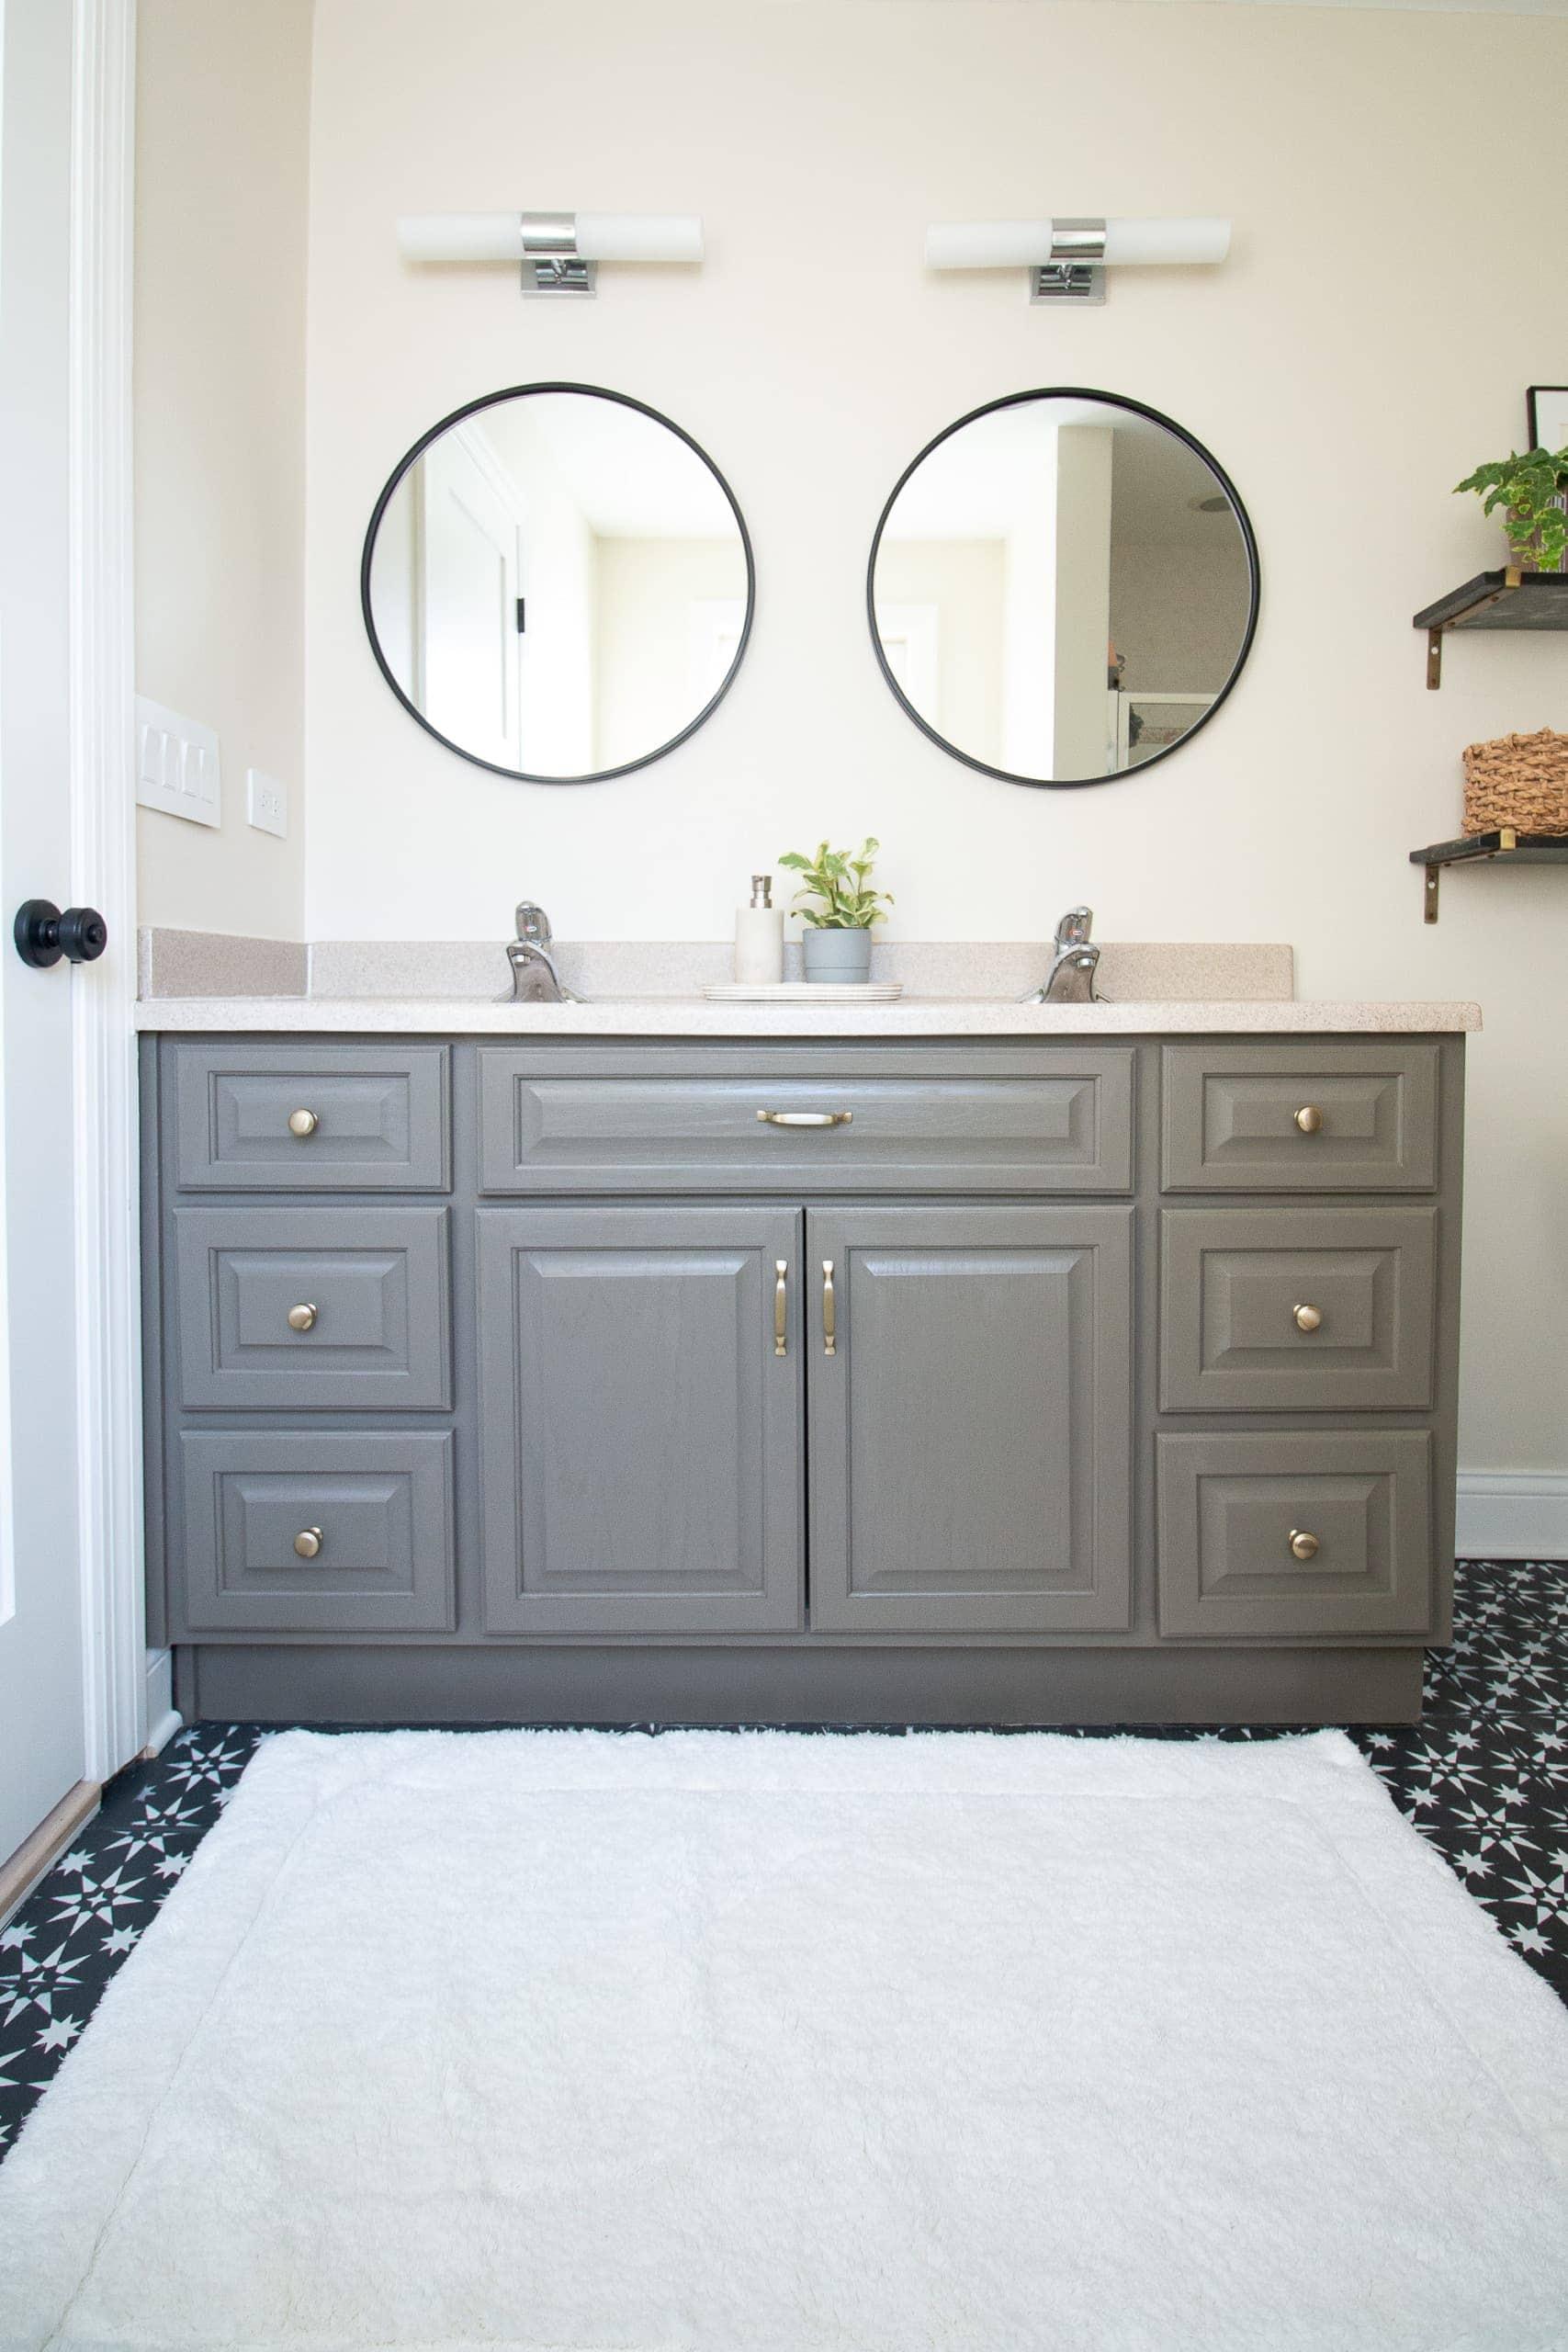 Bathroom vanity after